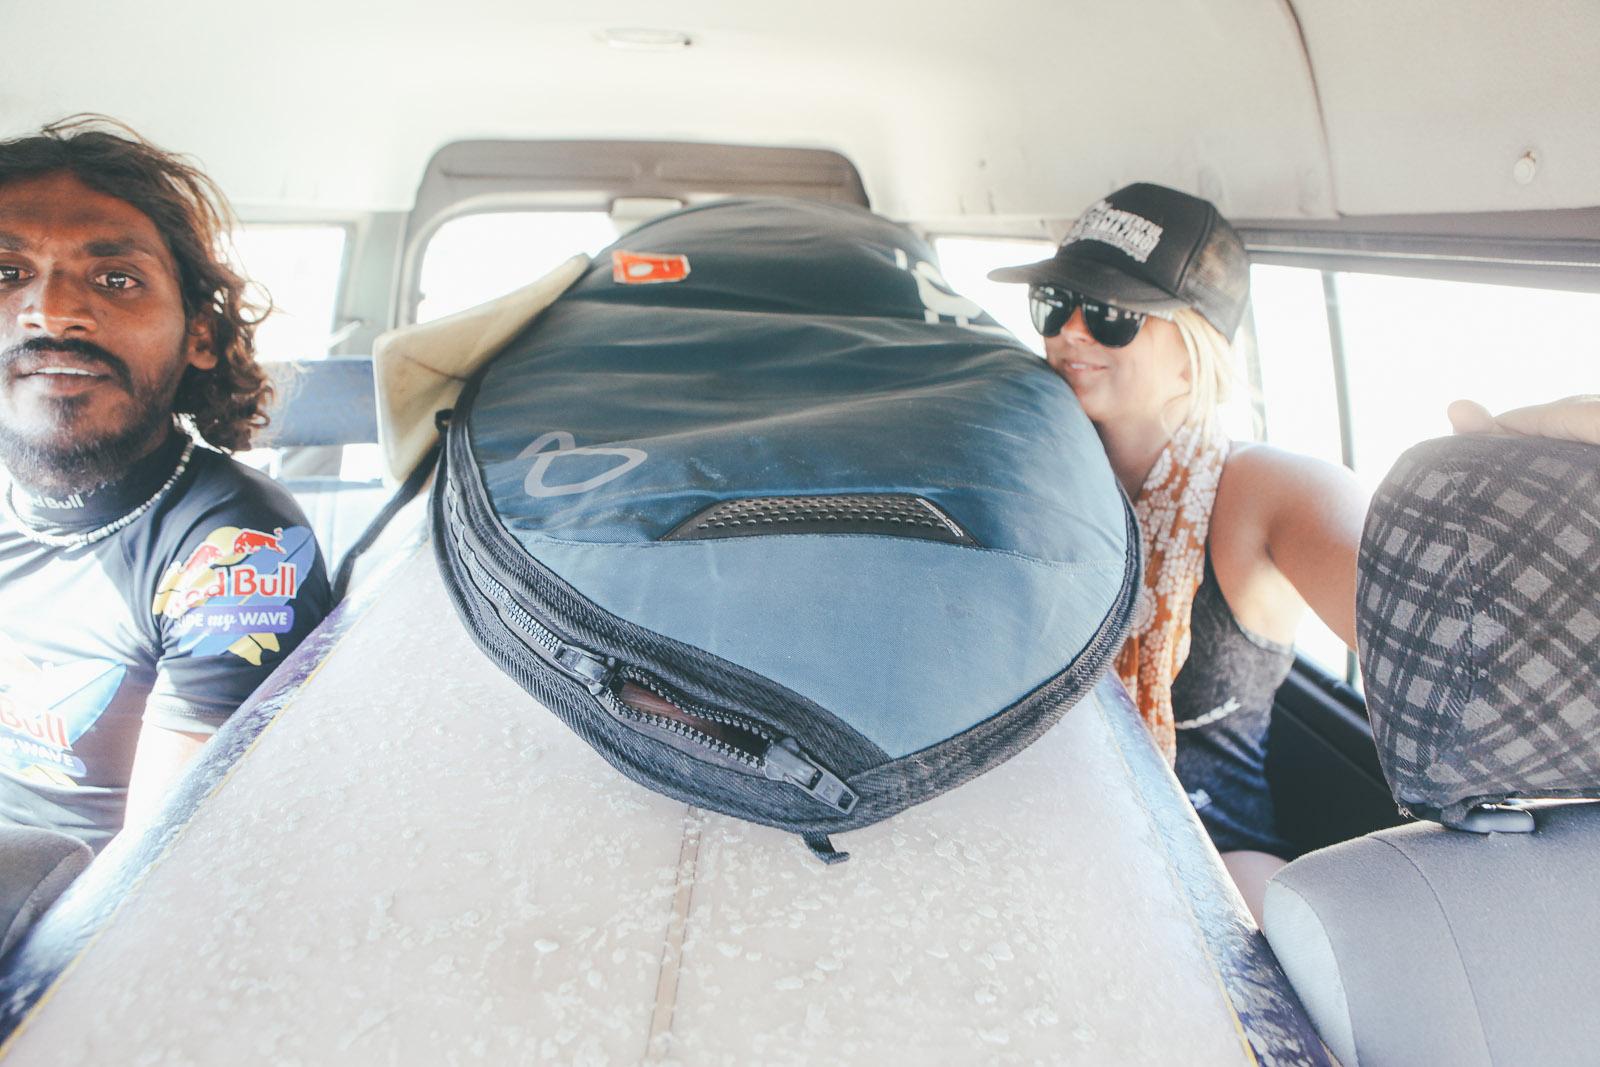 Sunshinestories-surf-travel-blog-IMG_2354